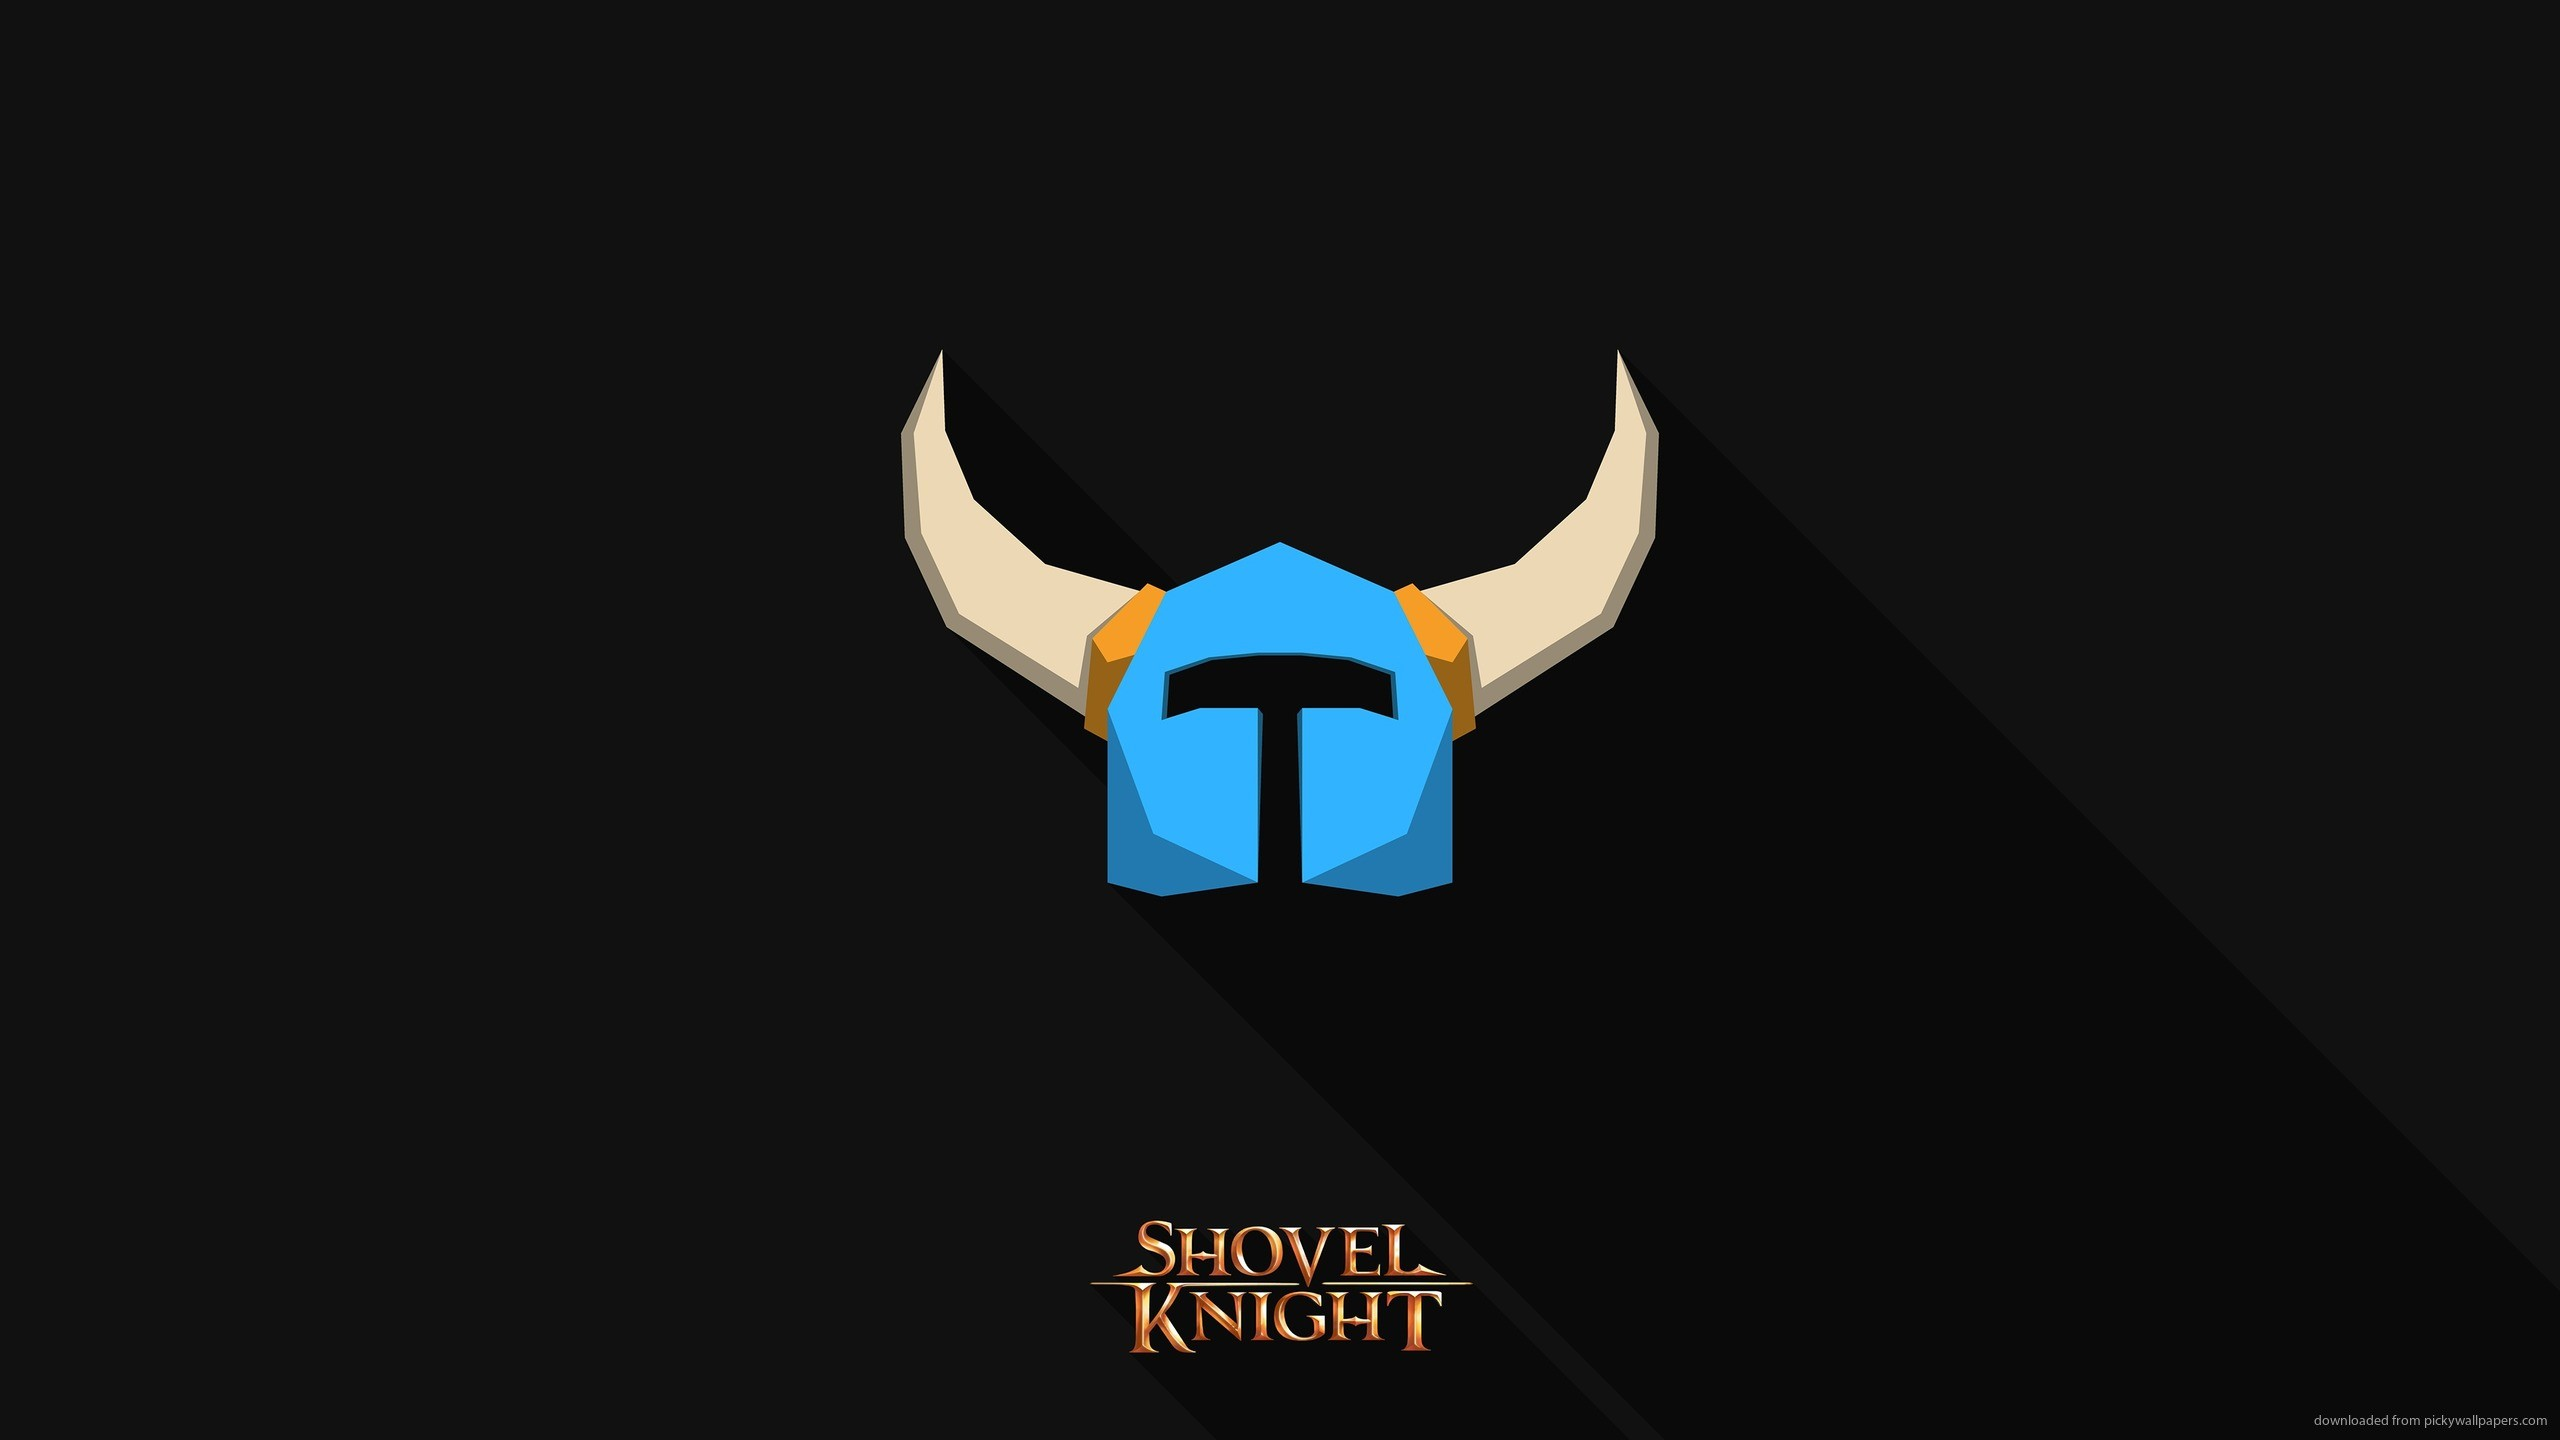 Minimalistic Shovel Knight Wallpaper for 2560×1440